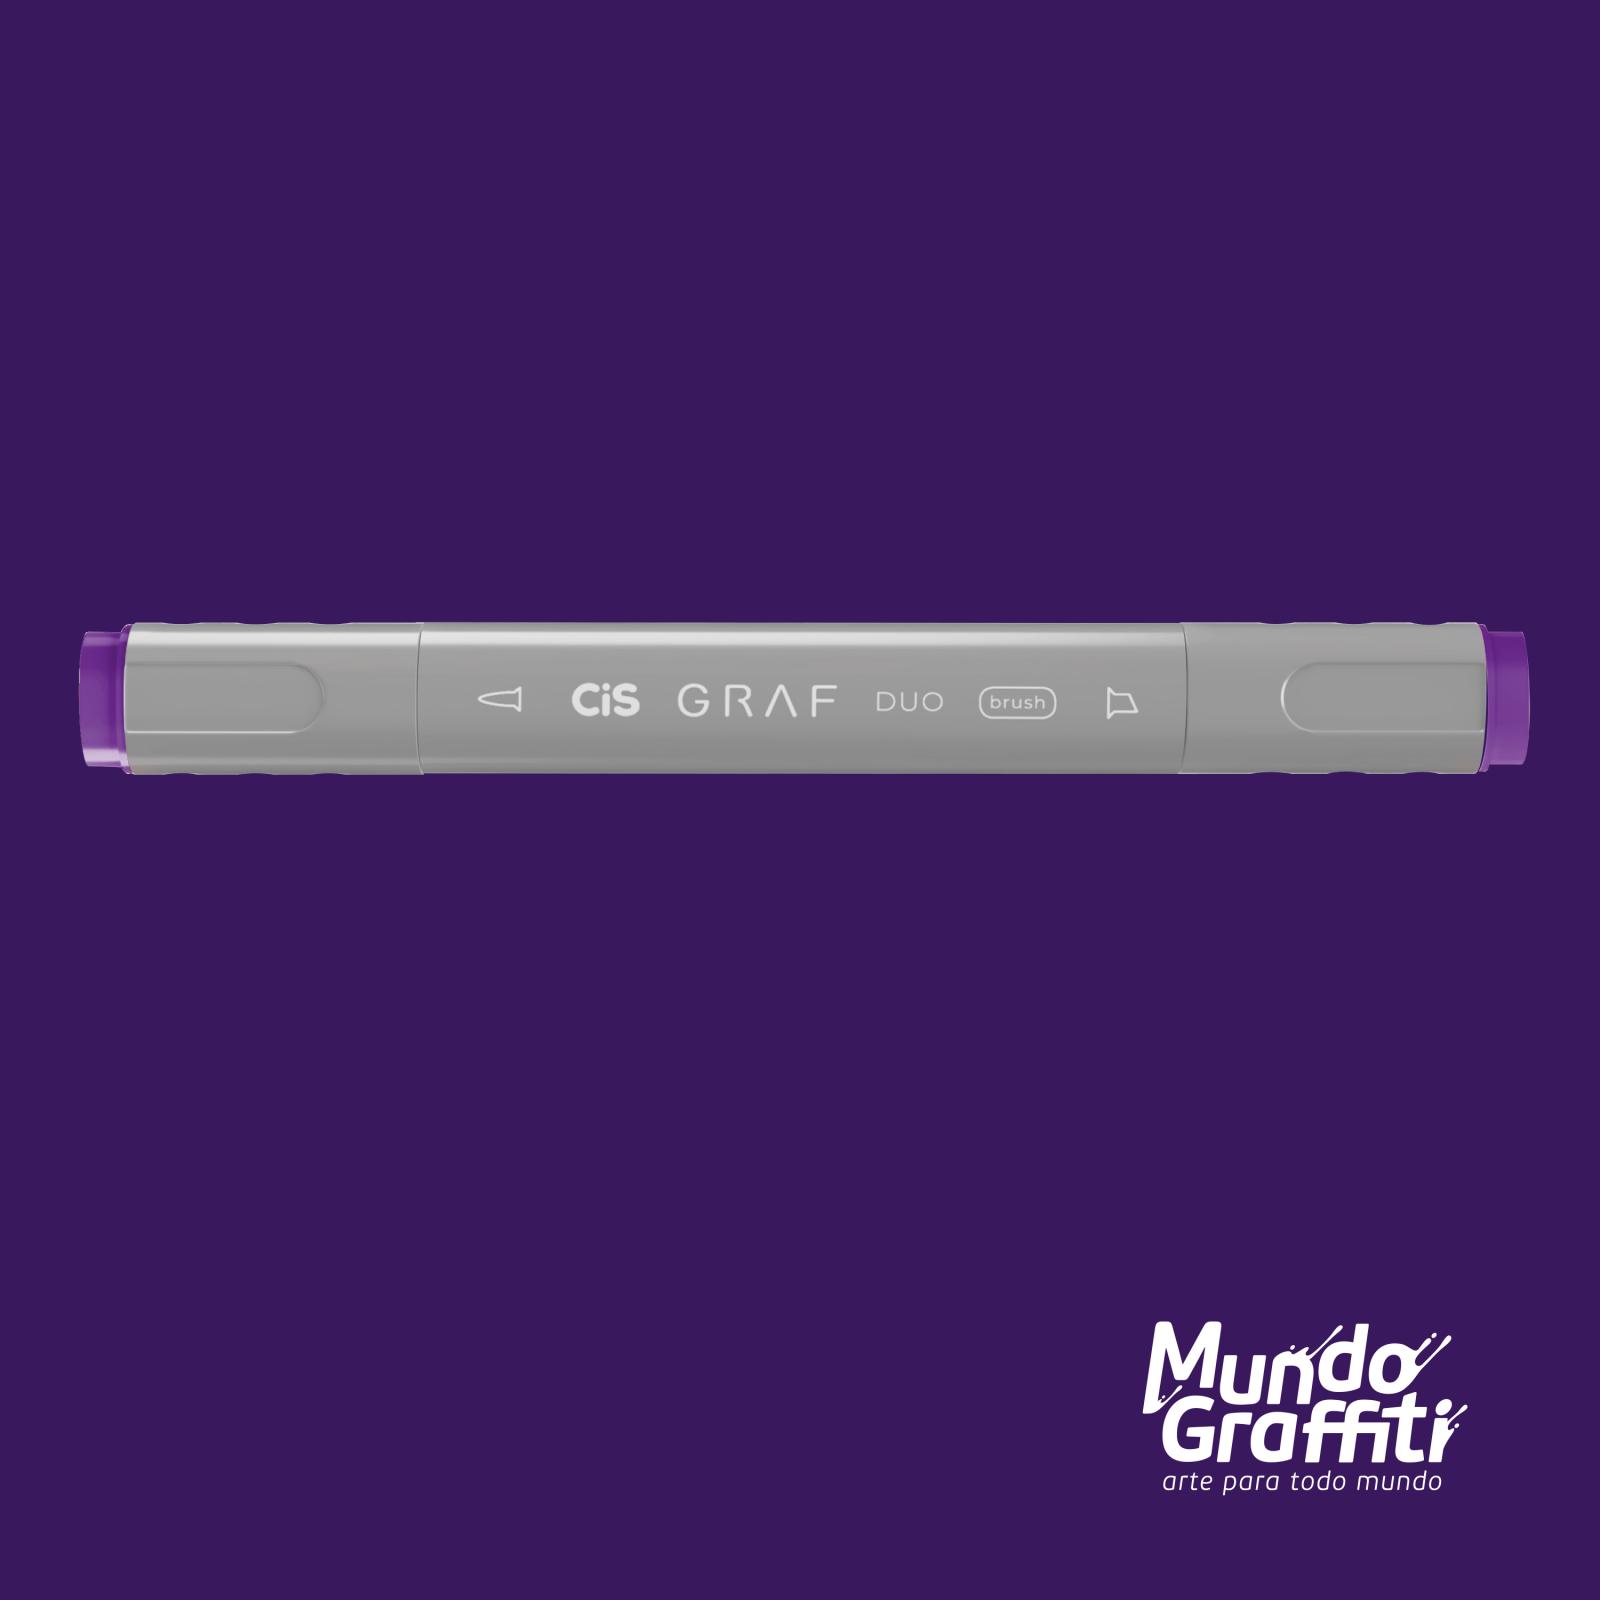 Marcador Cis Graf Duo Brush Ultra Marine 73 - Mundo Graffiti